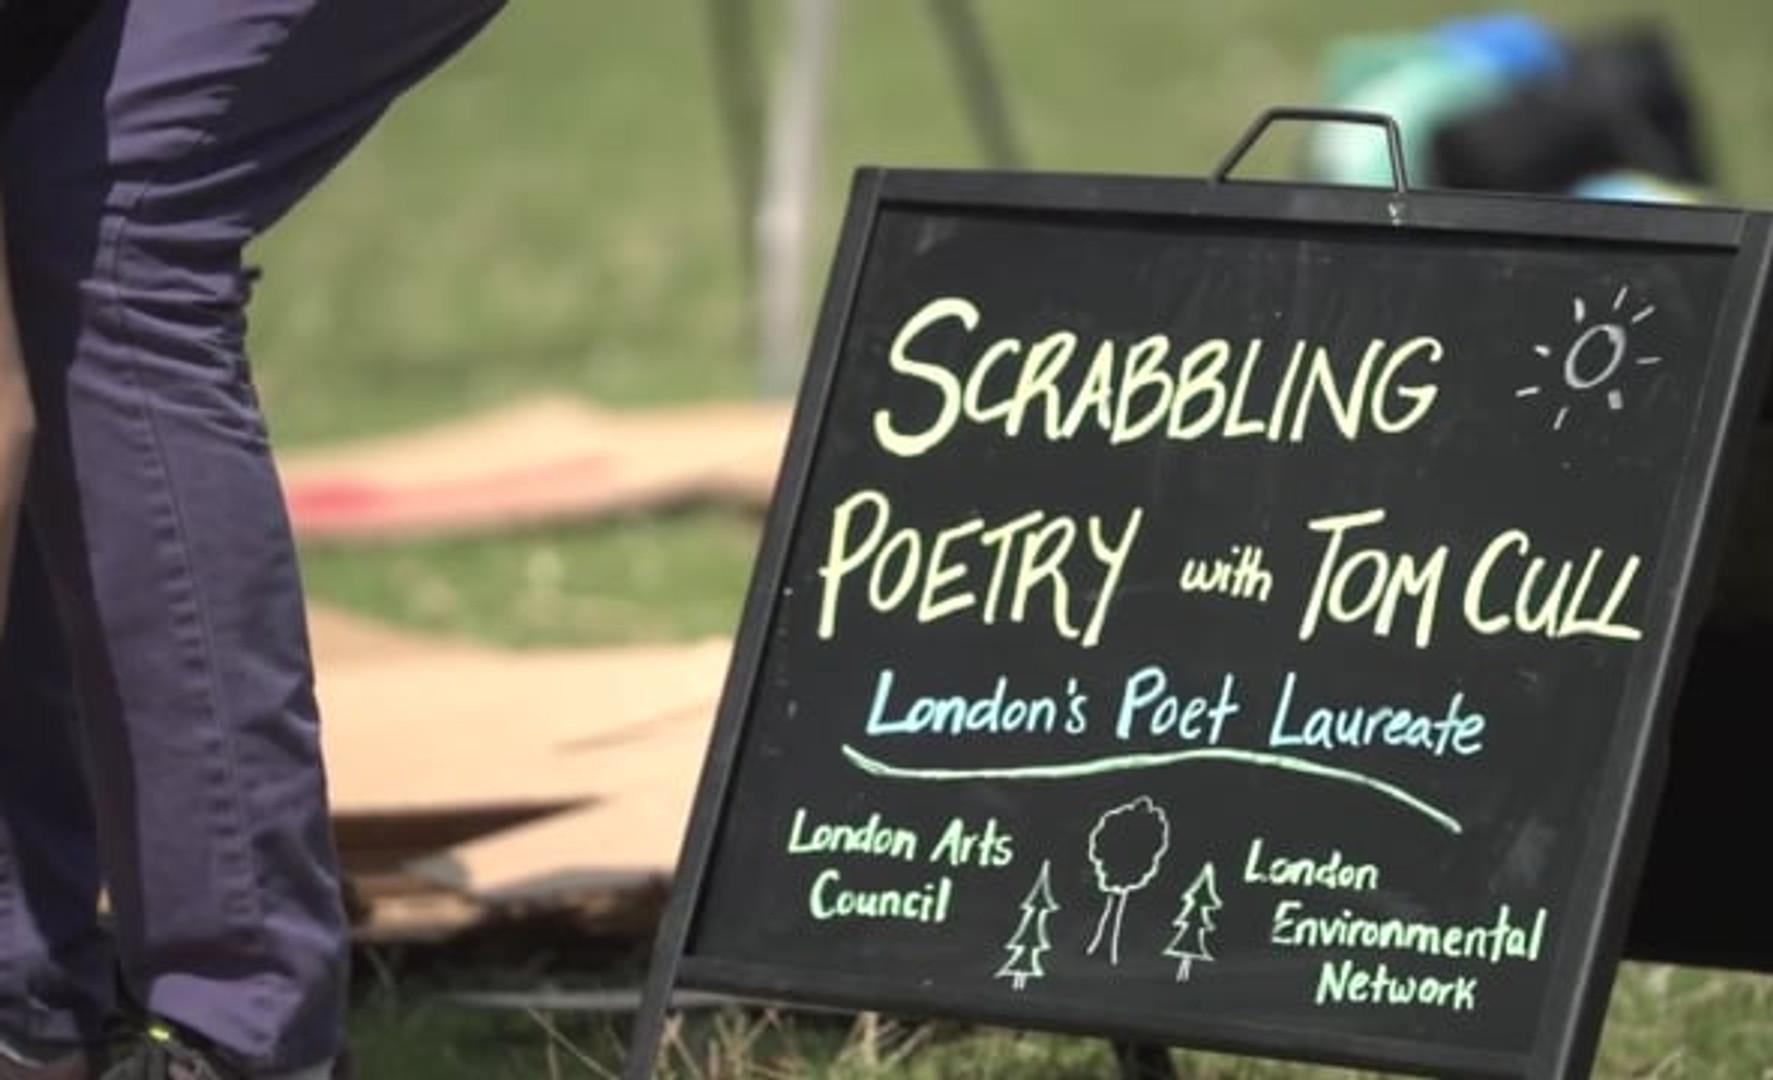 Poet Laureate Presents... Art and Environment: Scrabbling Poetry